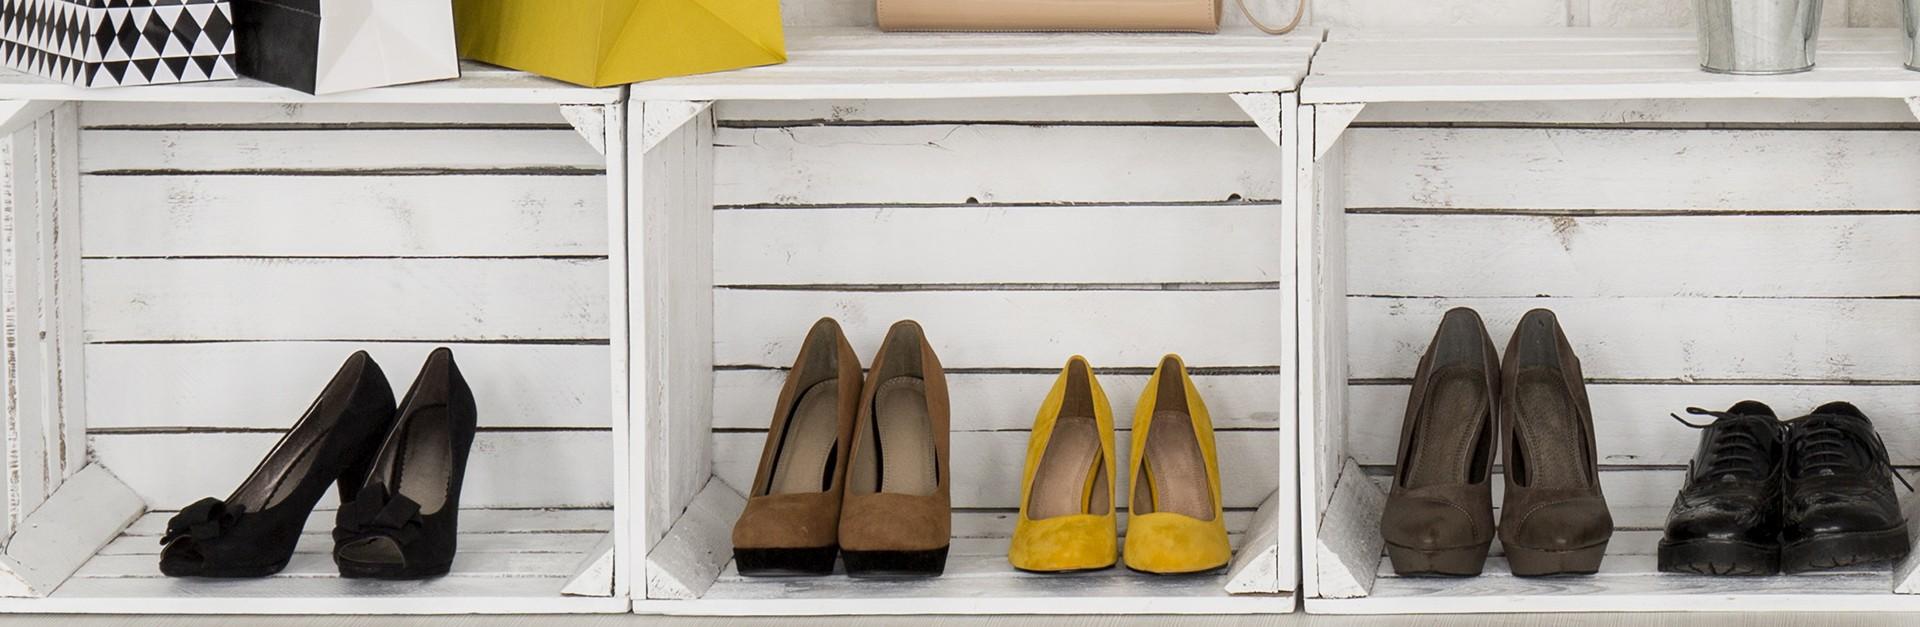 Shoes in cubbies